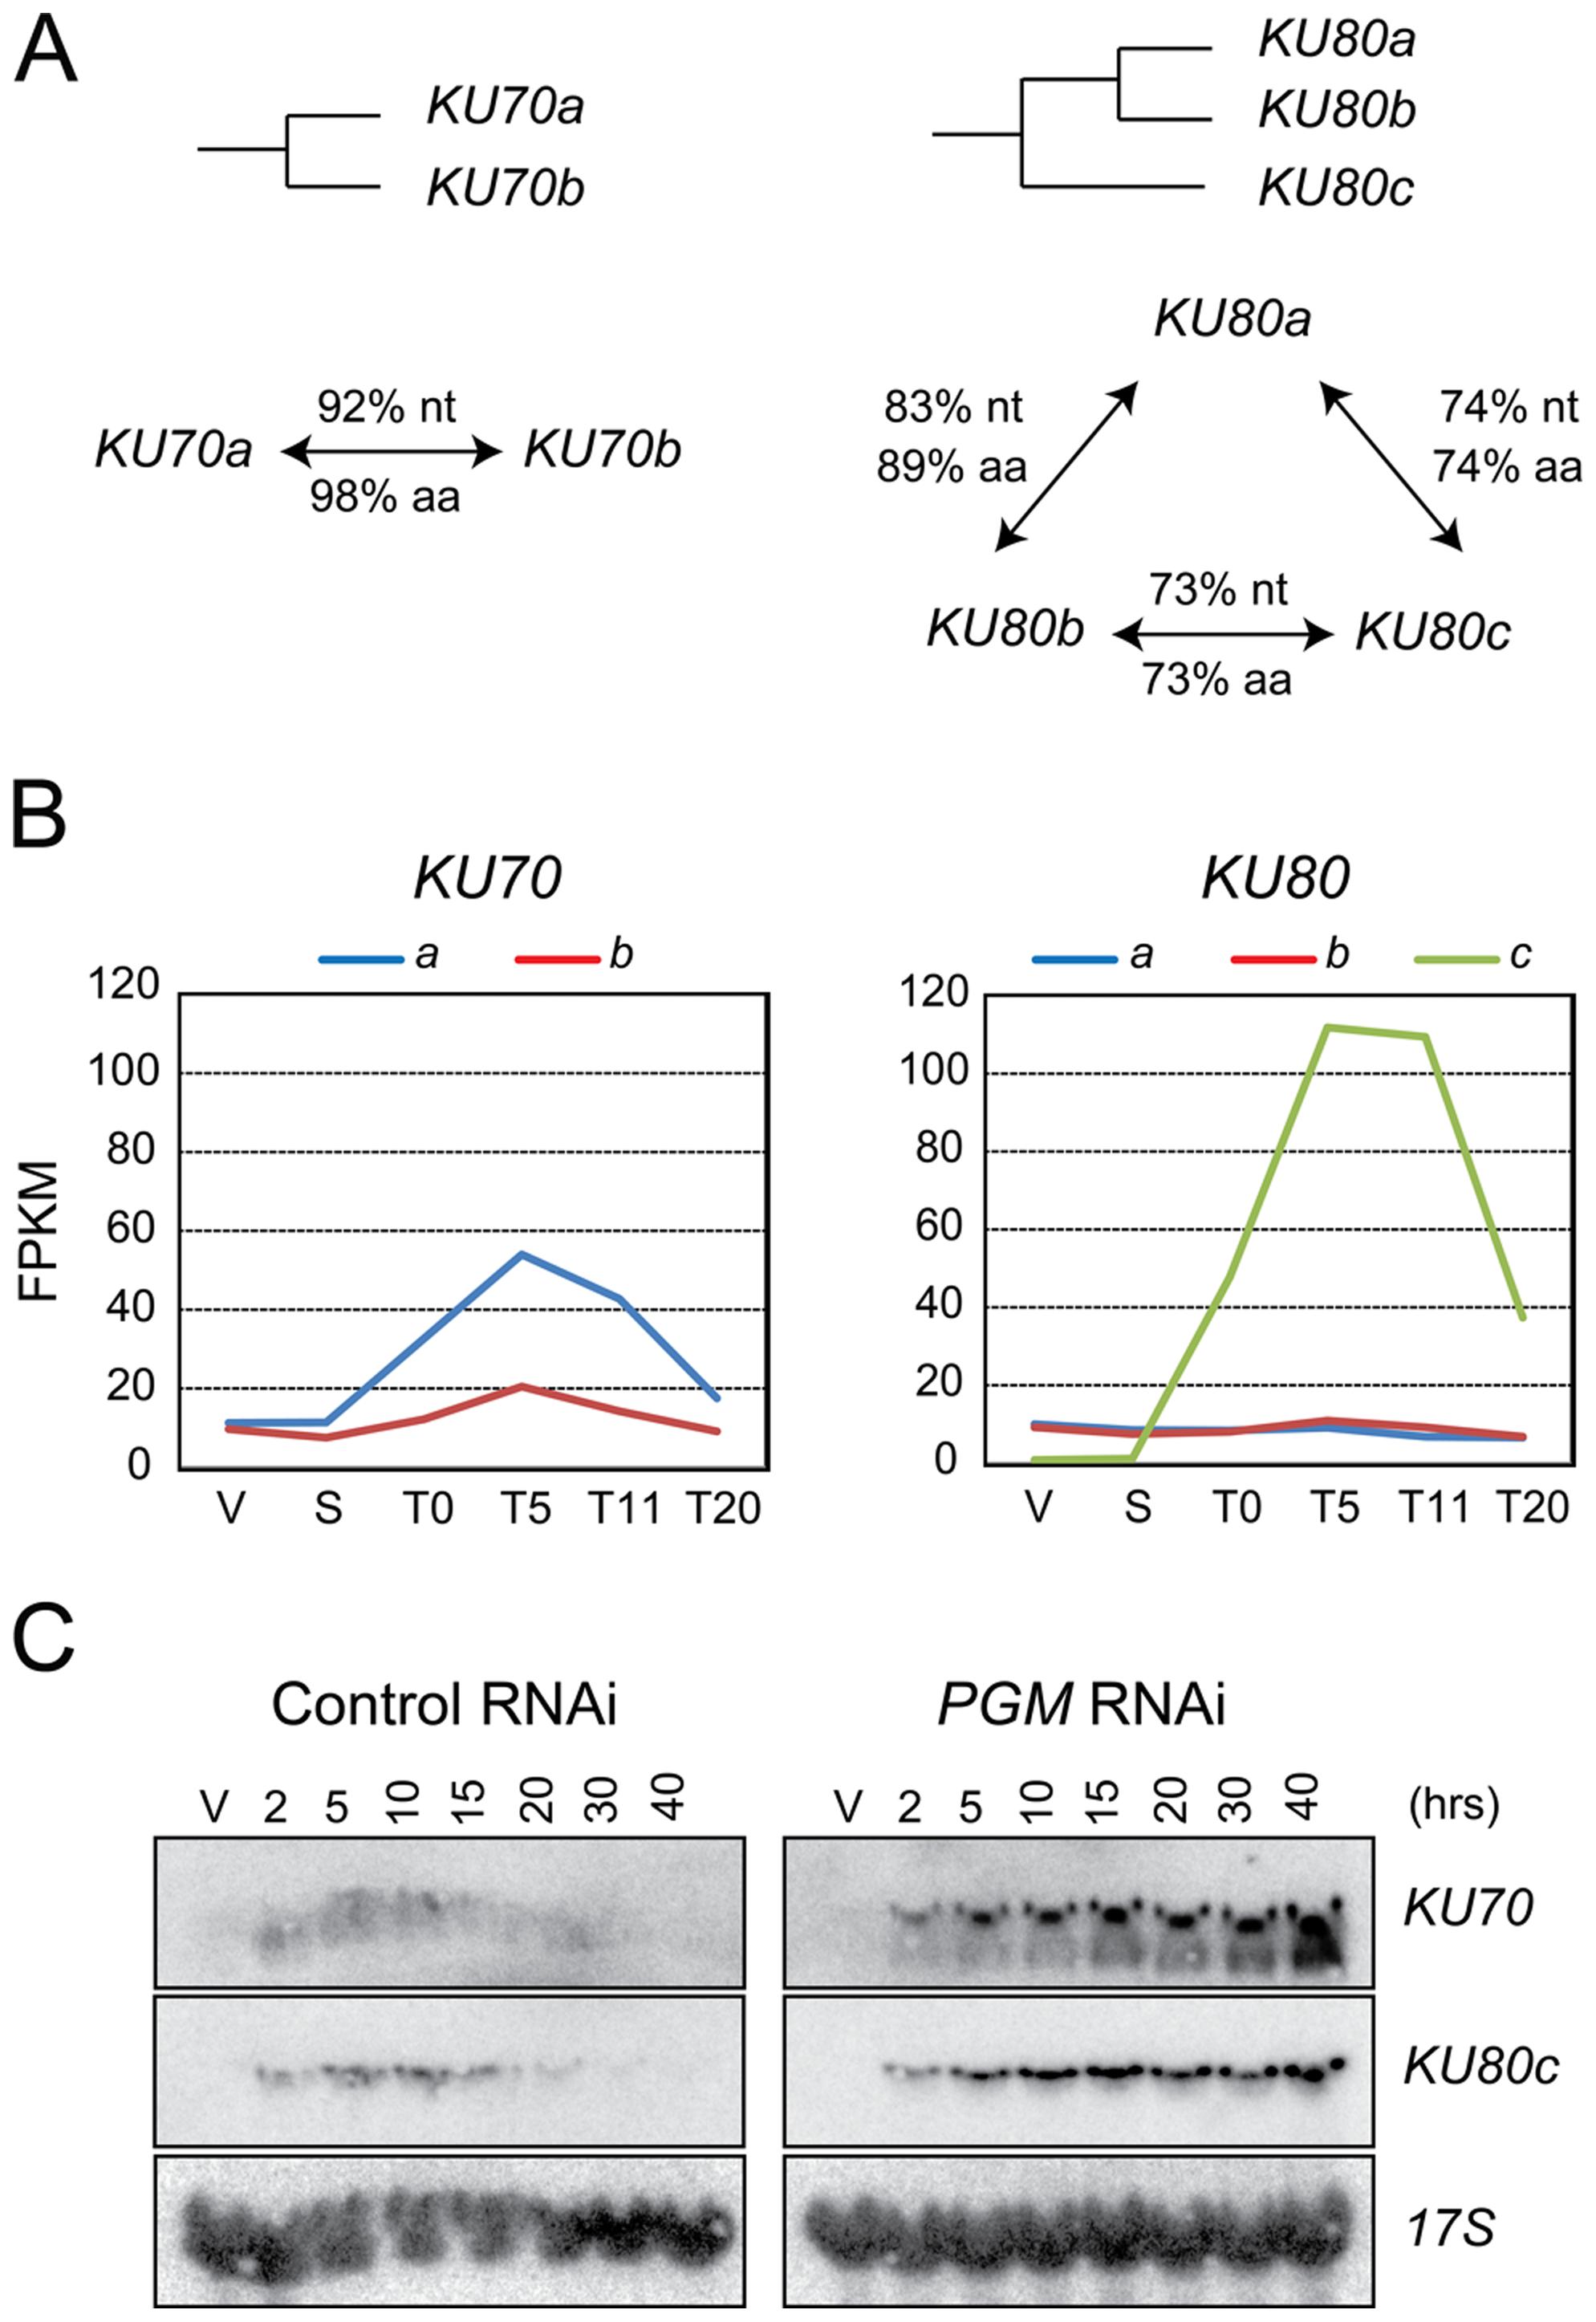 <i>KU70</i> and <i>KU80</i> genes in <i>P. tetraurelia</i>.